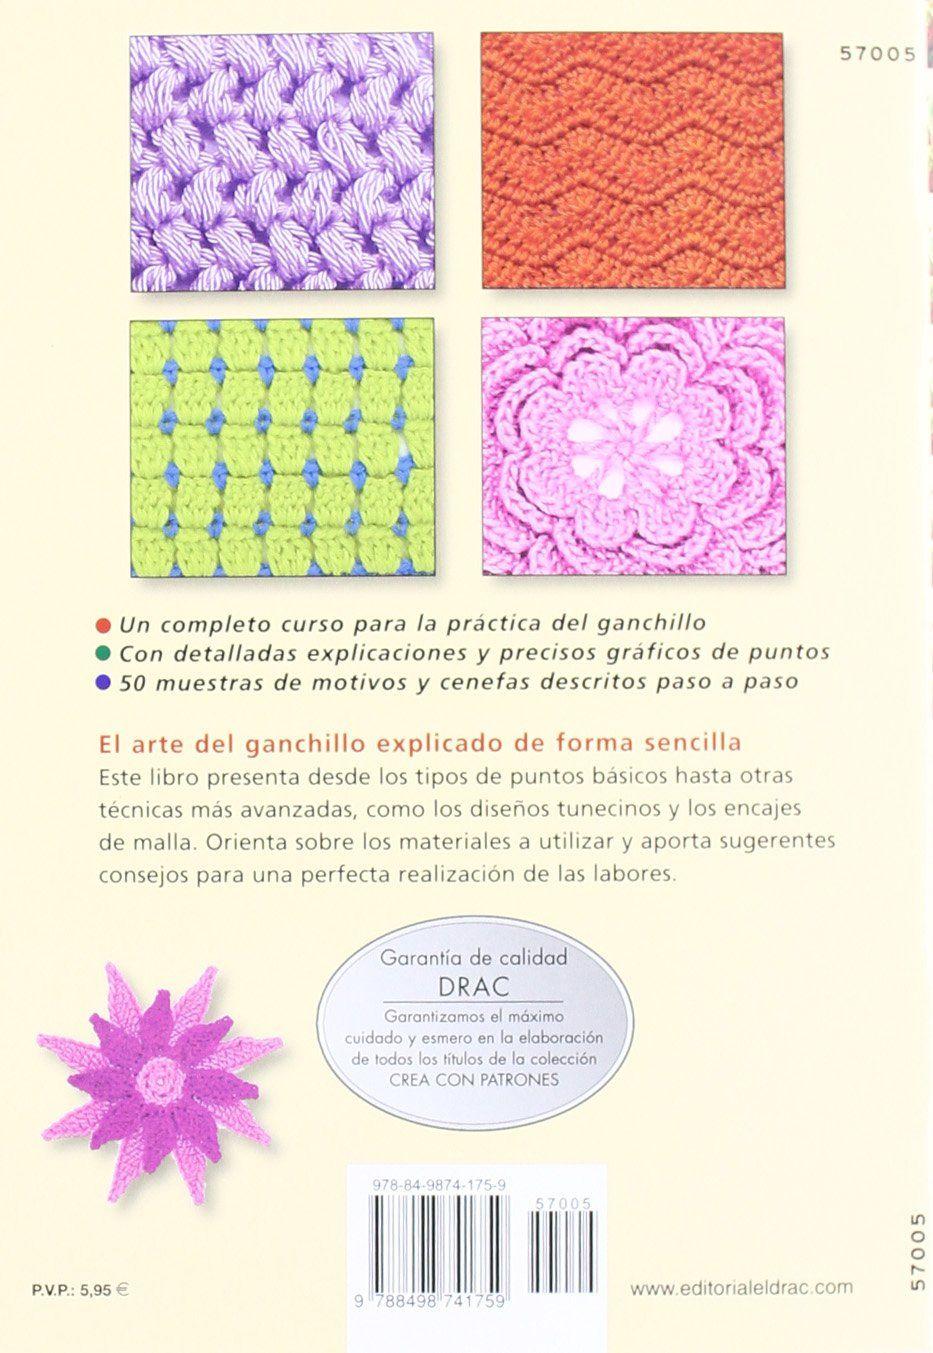 Curso Práctico De Ganchillo Cp Serie Ganchillo drac: Amazon.es: Anne ...